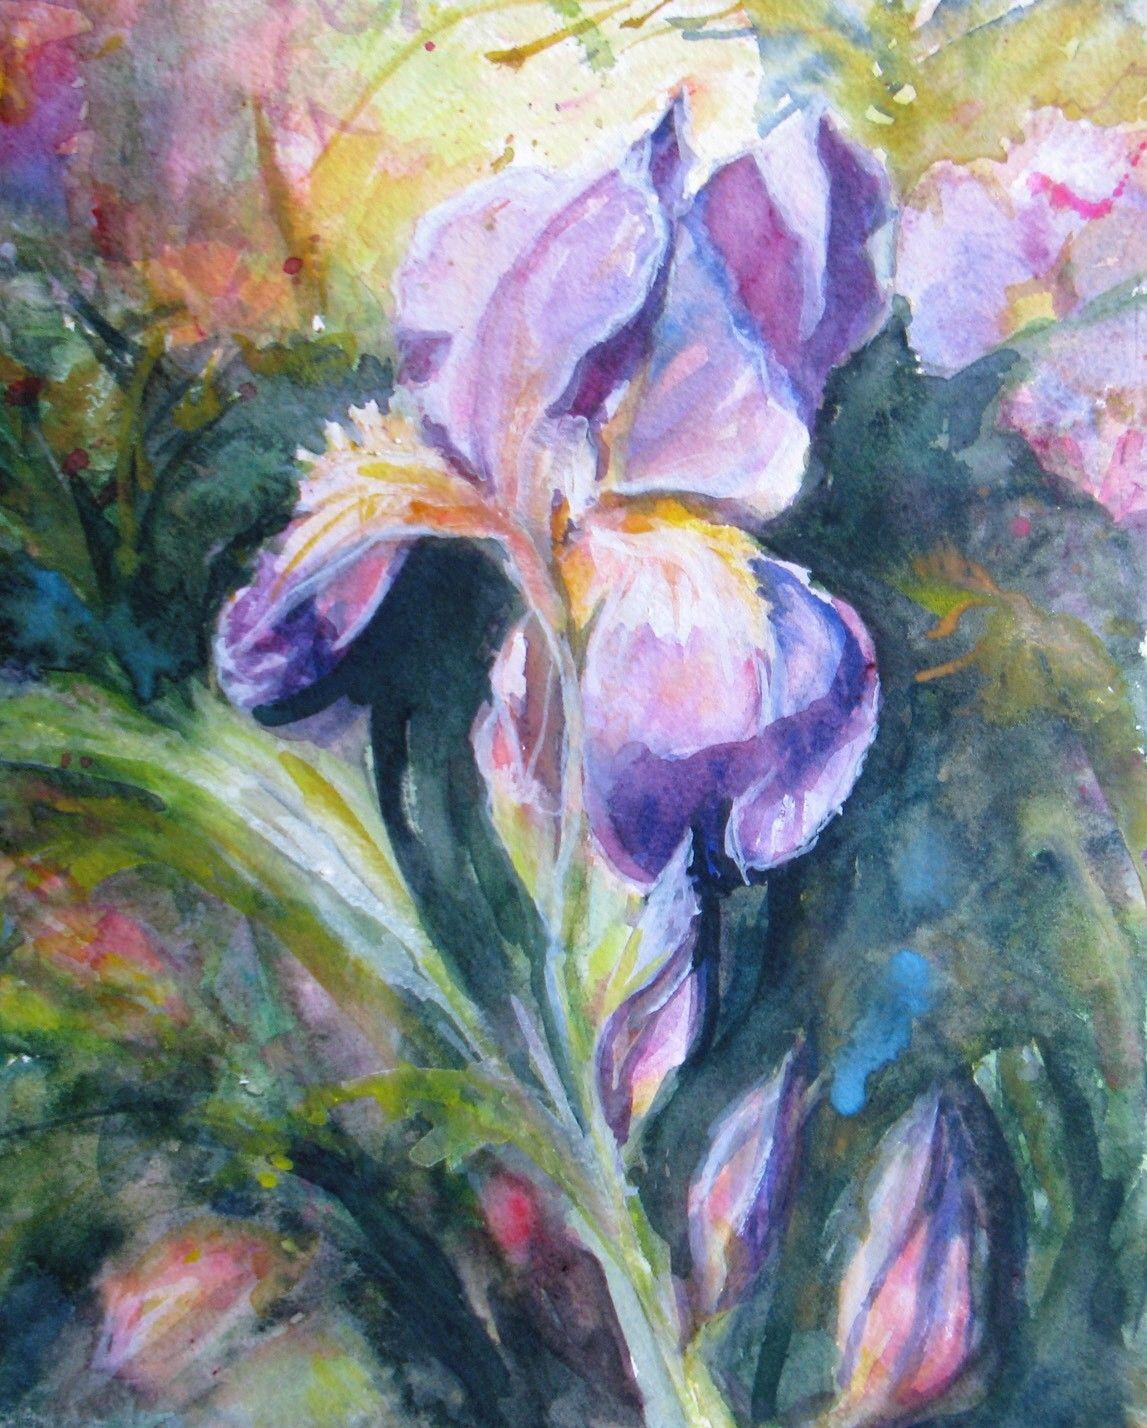 Abstract iris original watercolor painting flowers garden abstract iris original watercolor painting flowers garden impressionism modern portrait 8 x 10 fine art izmirmasajfo